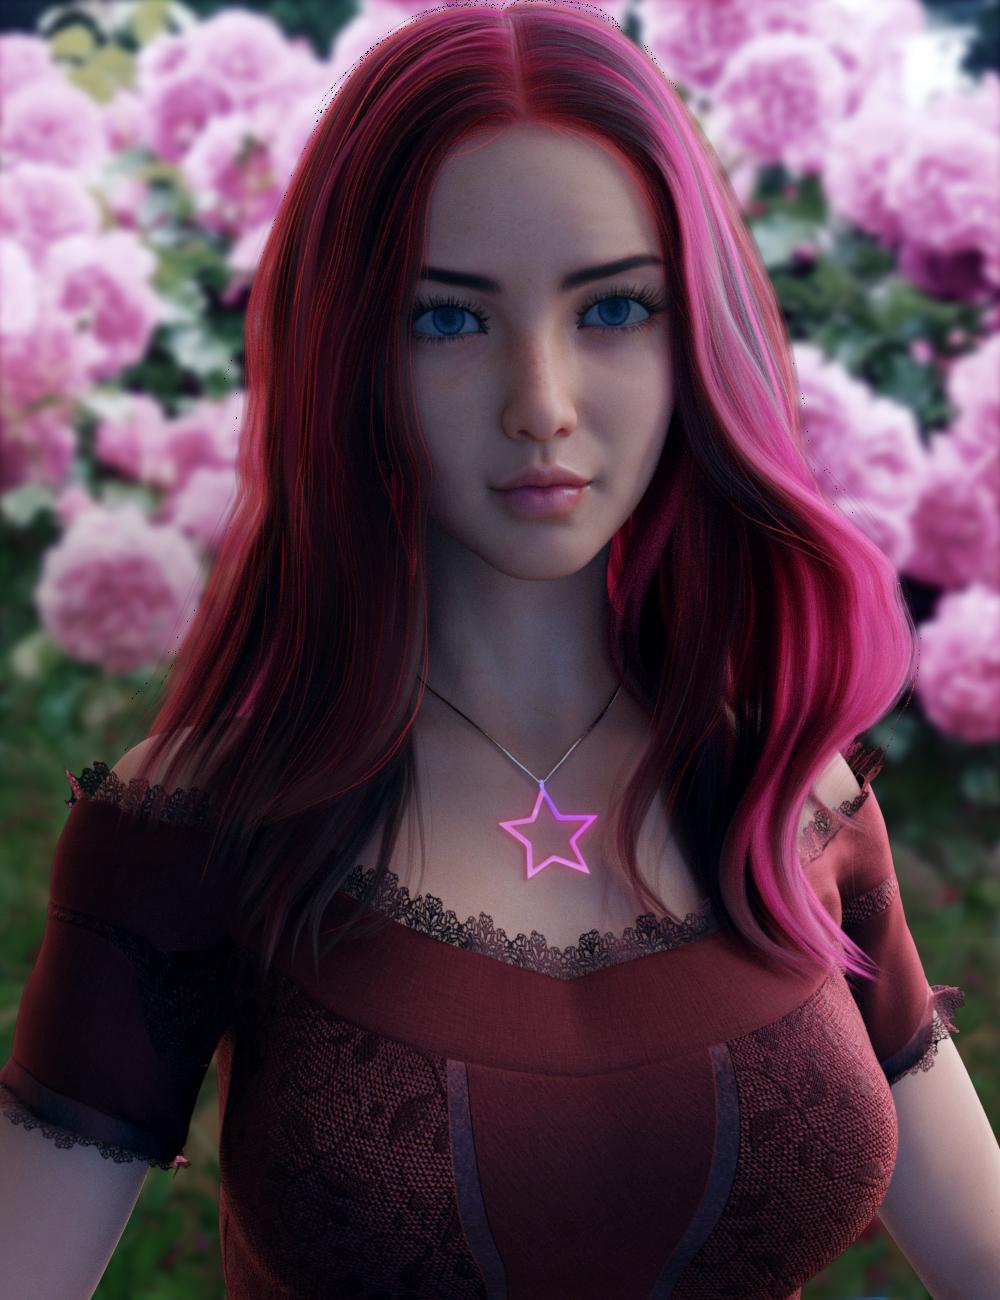 Vo Rose for Genesis 8.1 Female by: VOOTW, 3D Models by Daz 3D